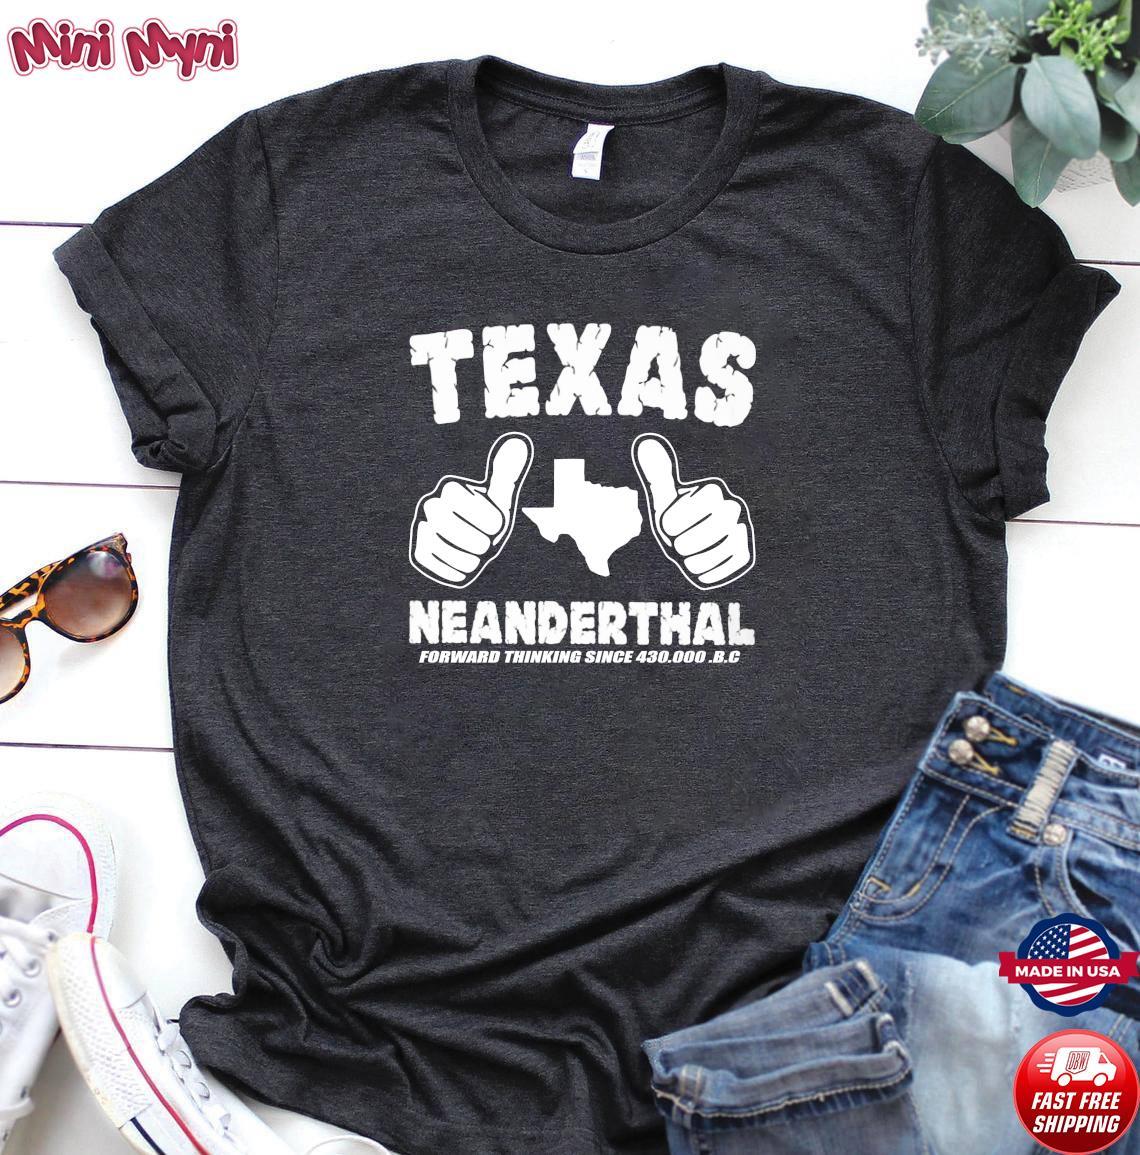 Like Texas Neanderthal Forward Thinking Since 430 000 Bc Shirt